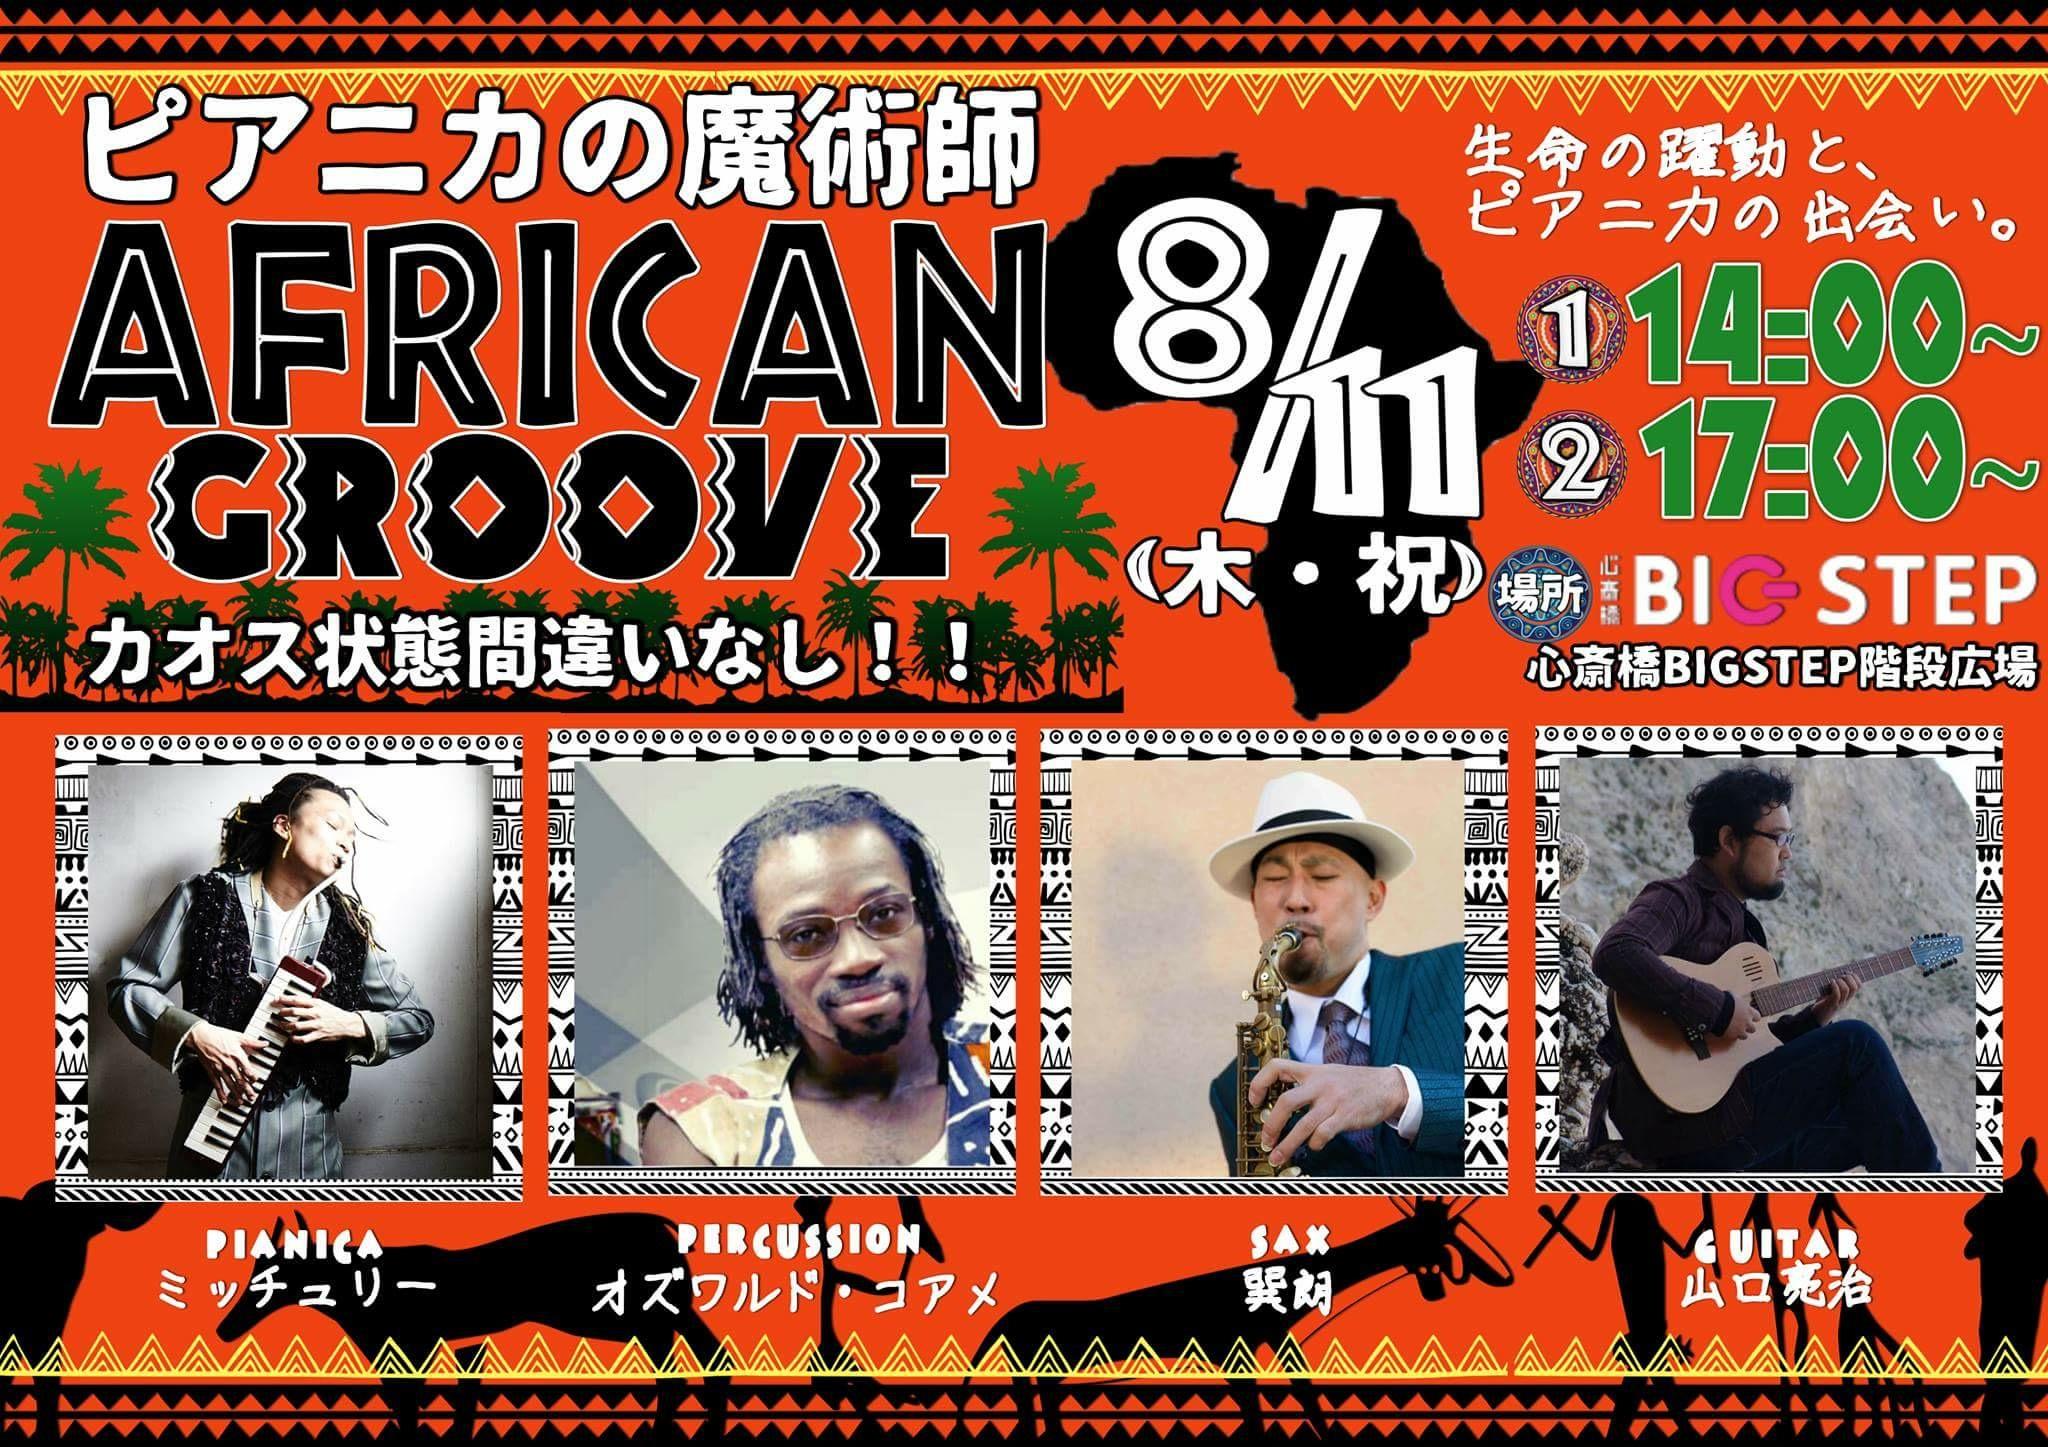 Mi3 Pianica「AFRICAN GROOVE」@Shinsaibashi BIGSTEP(photos)